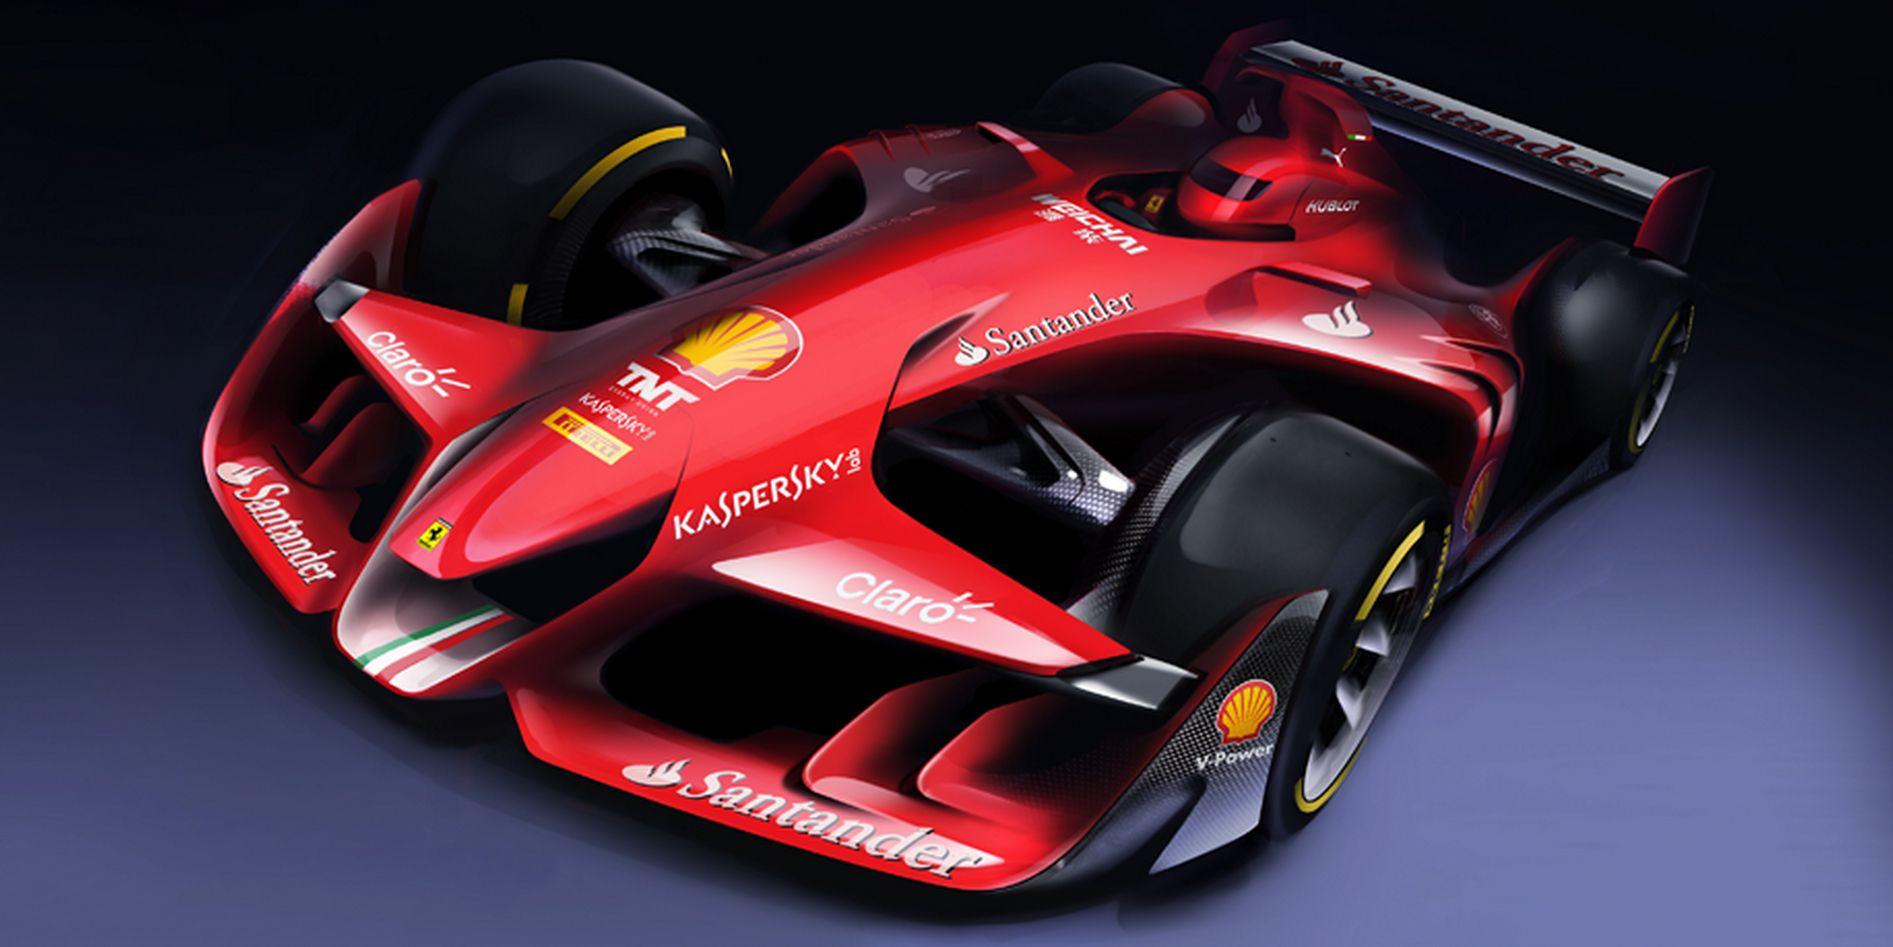 Here S Ferrari S Concept For A More Beautiful F1 Car